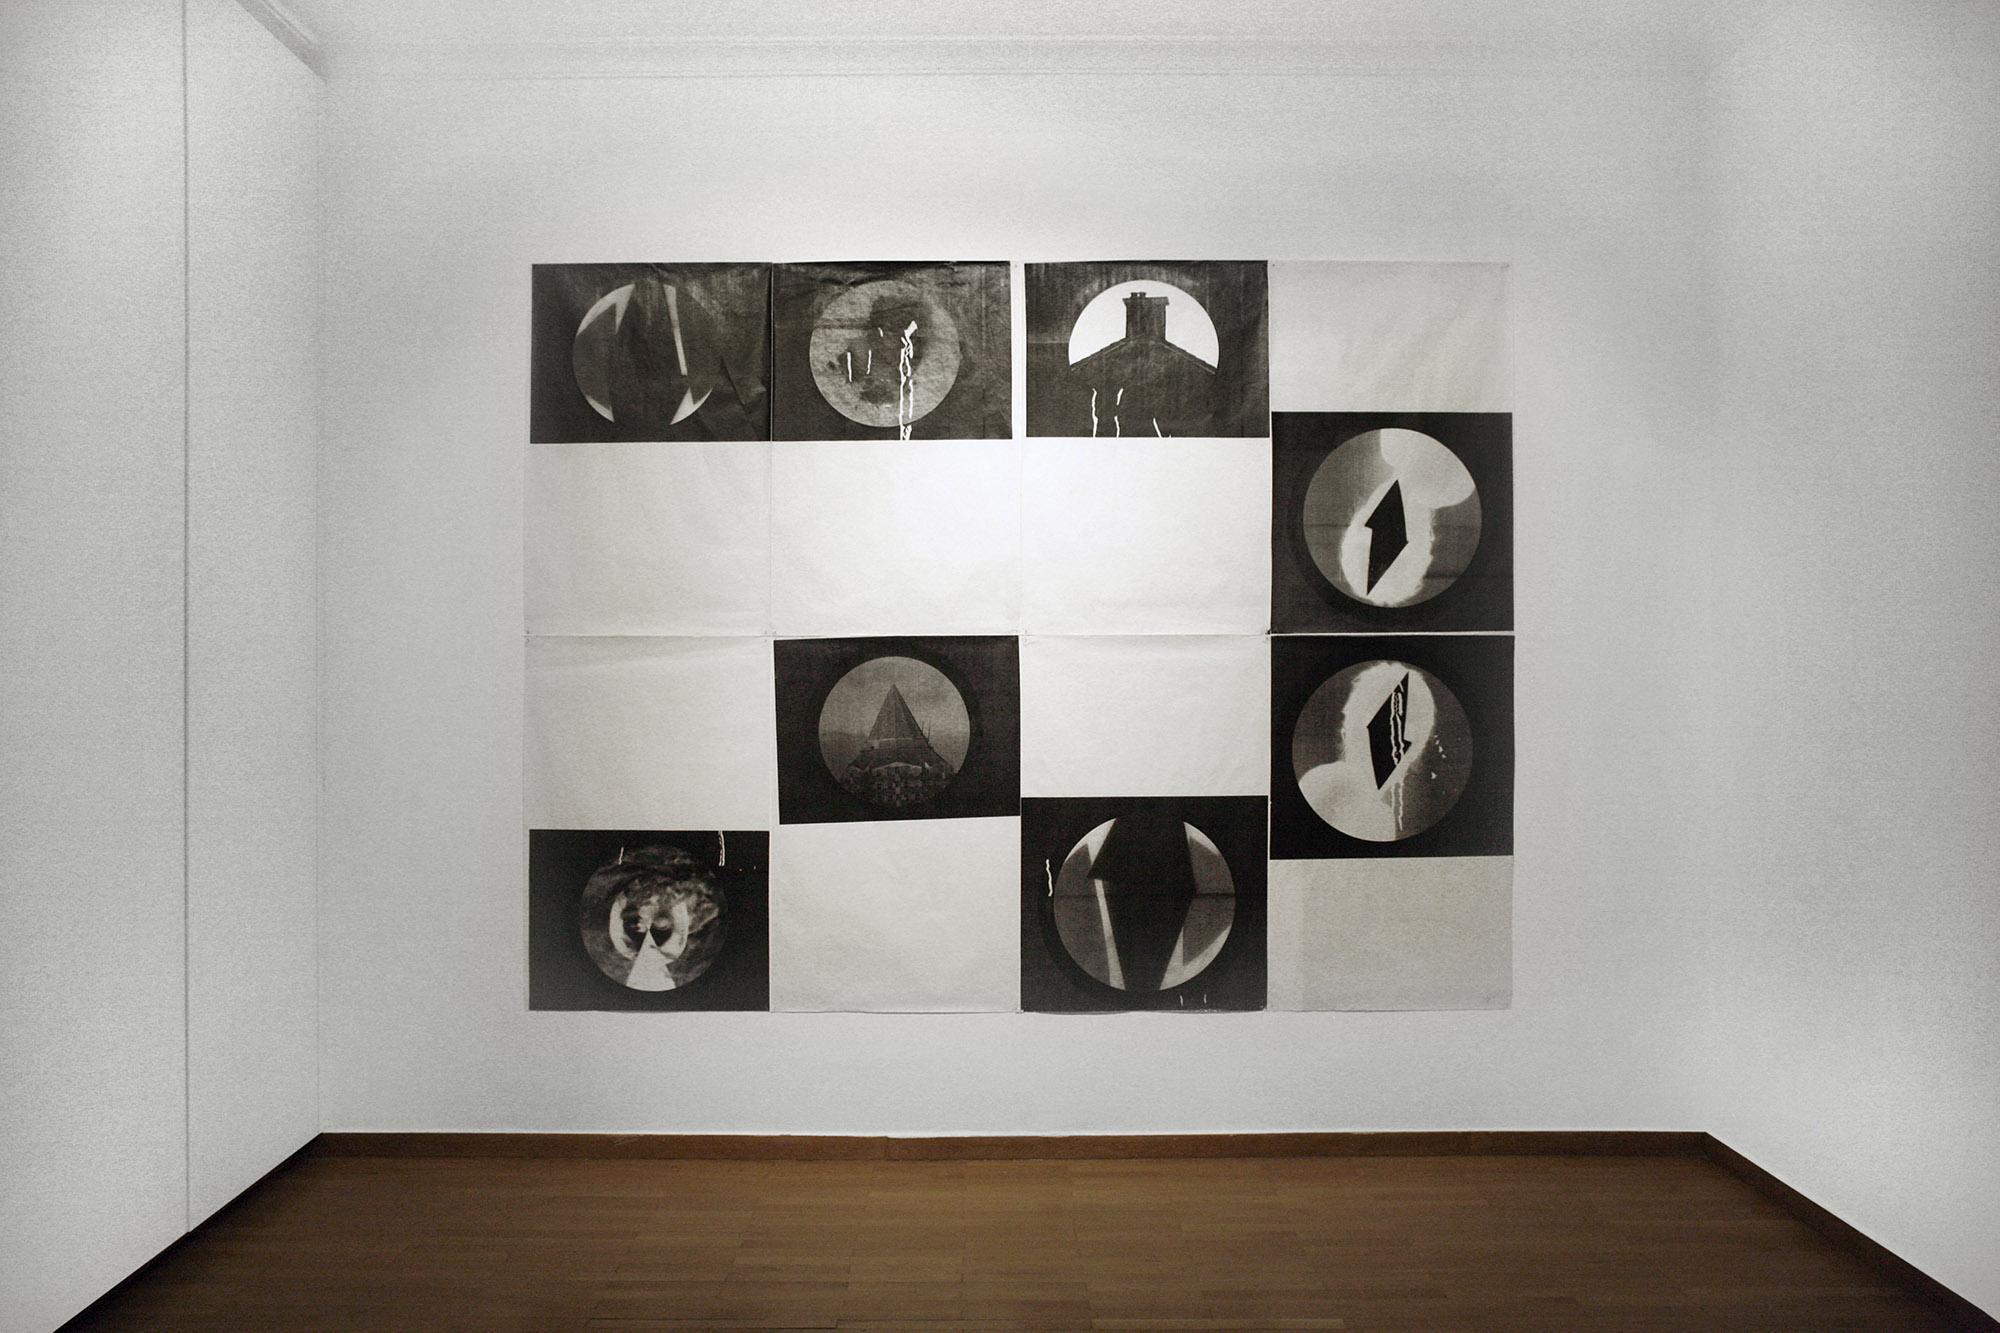 Ioanna Gouzeli / Spacesheep - Image 1